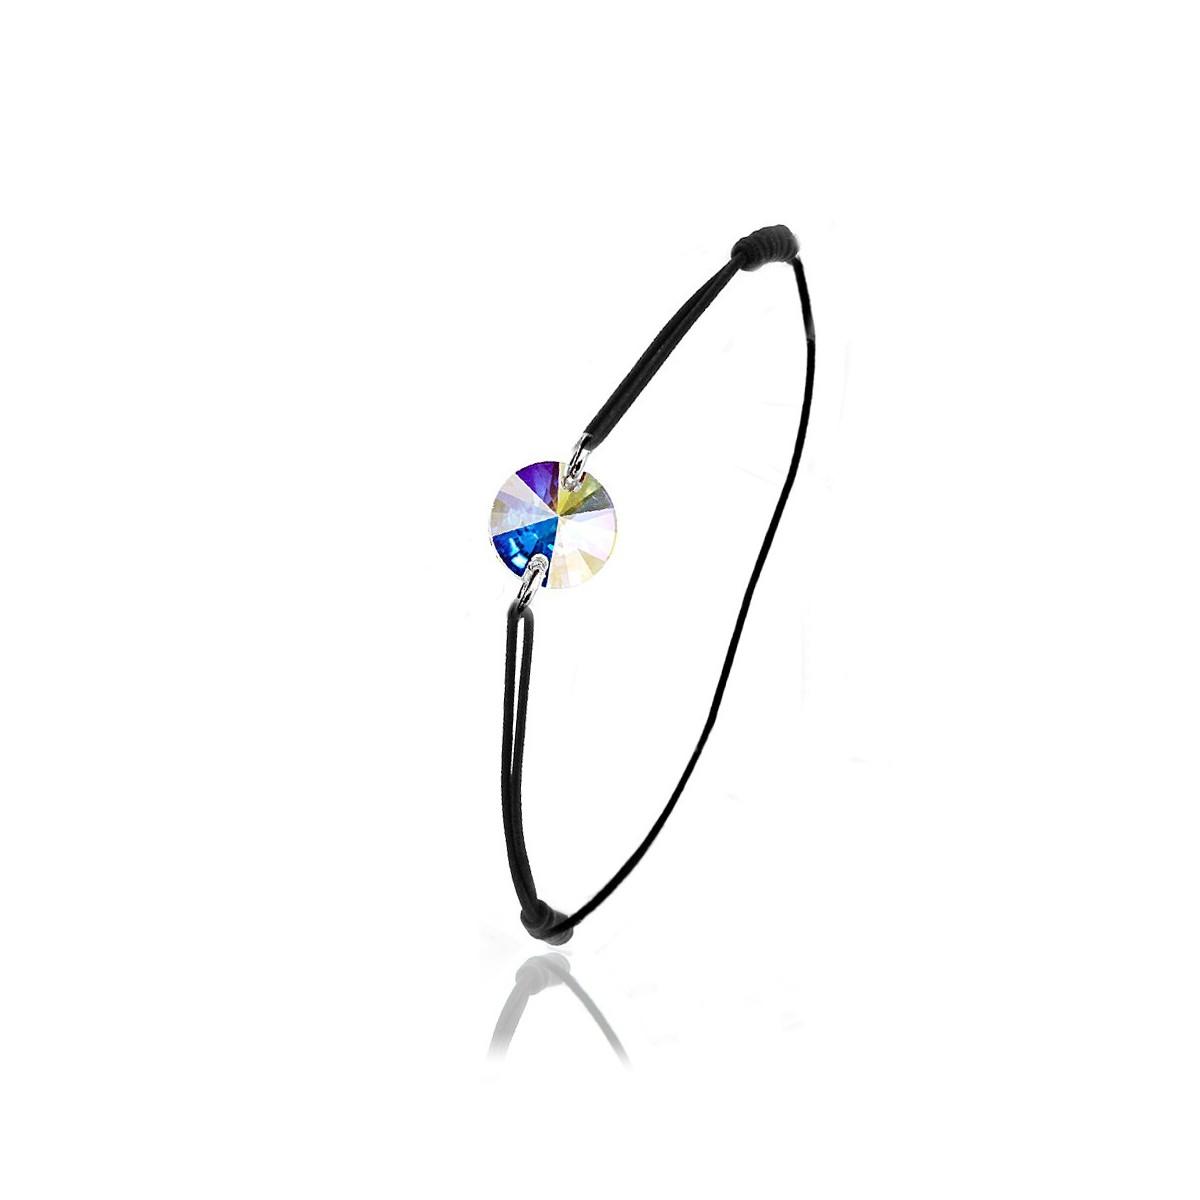 Bracelet élastique So Charm orné d'un cristal irisé made with crystal from Swarovski